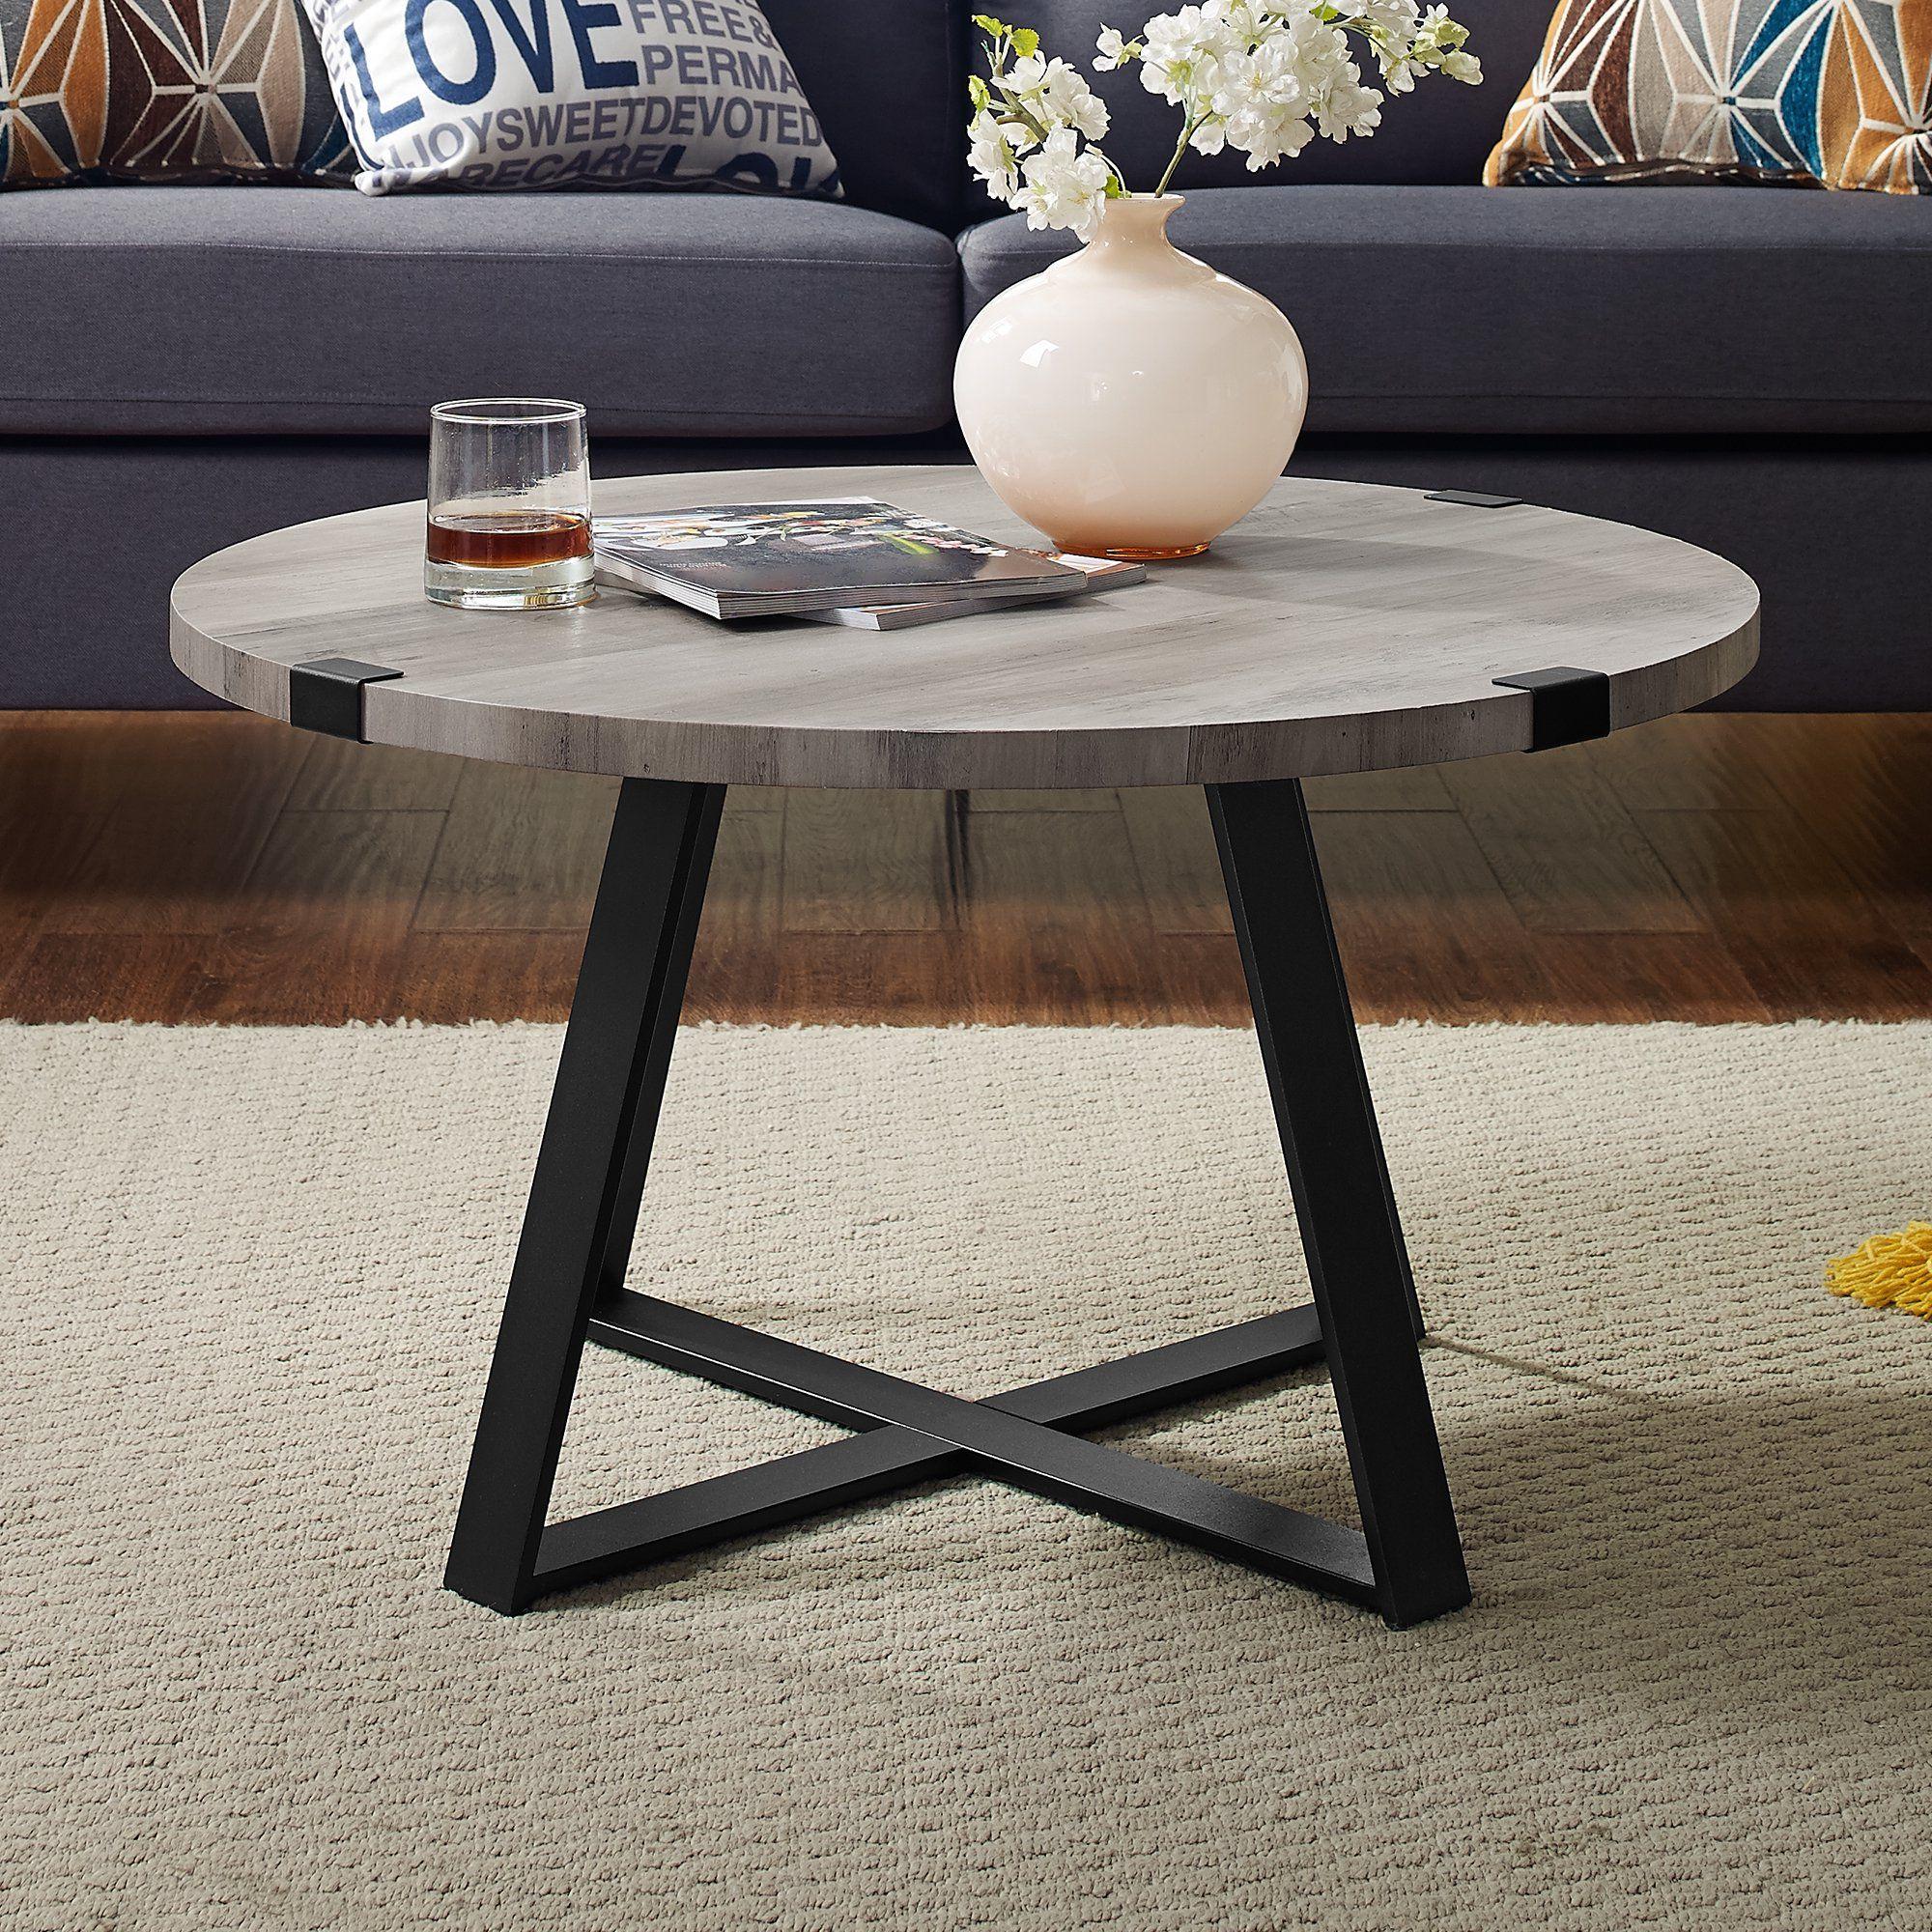 Slate Wrap Leg Dark Walnut Coffee Table By River Street Designs Walmart Com Coffee Table Grey Coffee Table Round Coffee Table [ 2000 x 2000 Pixel ]